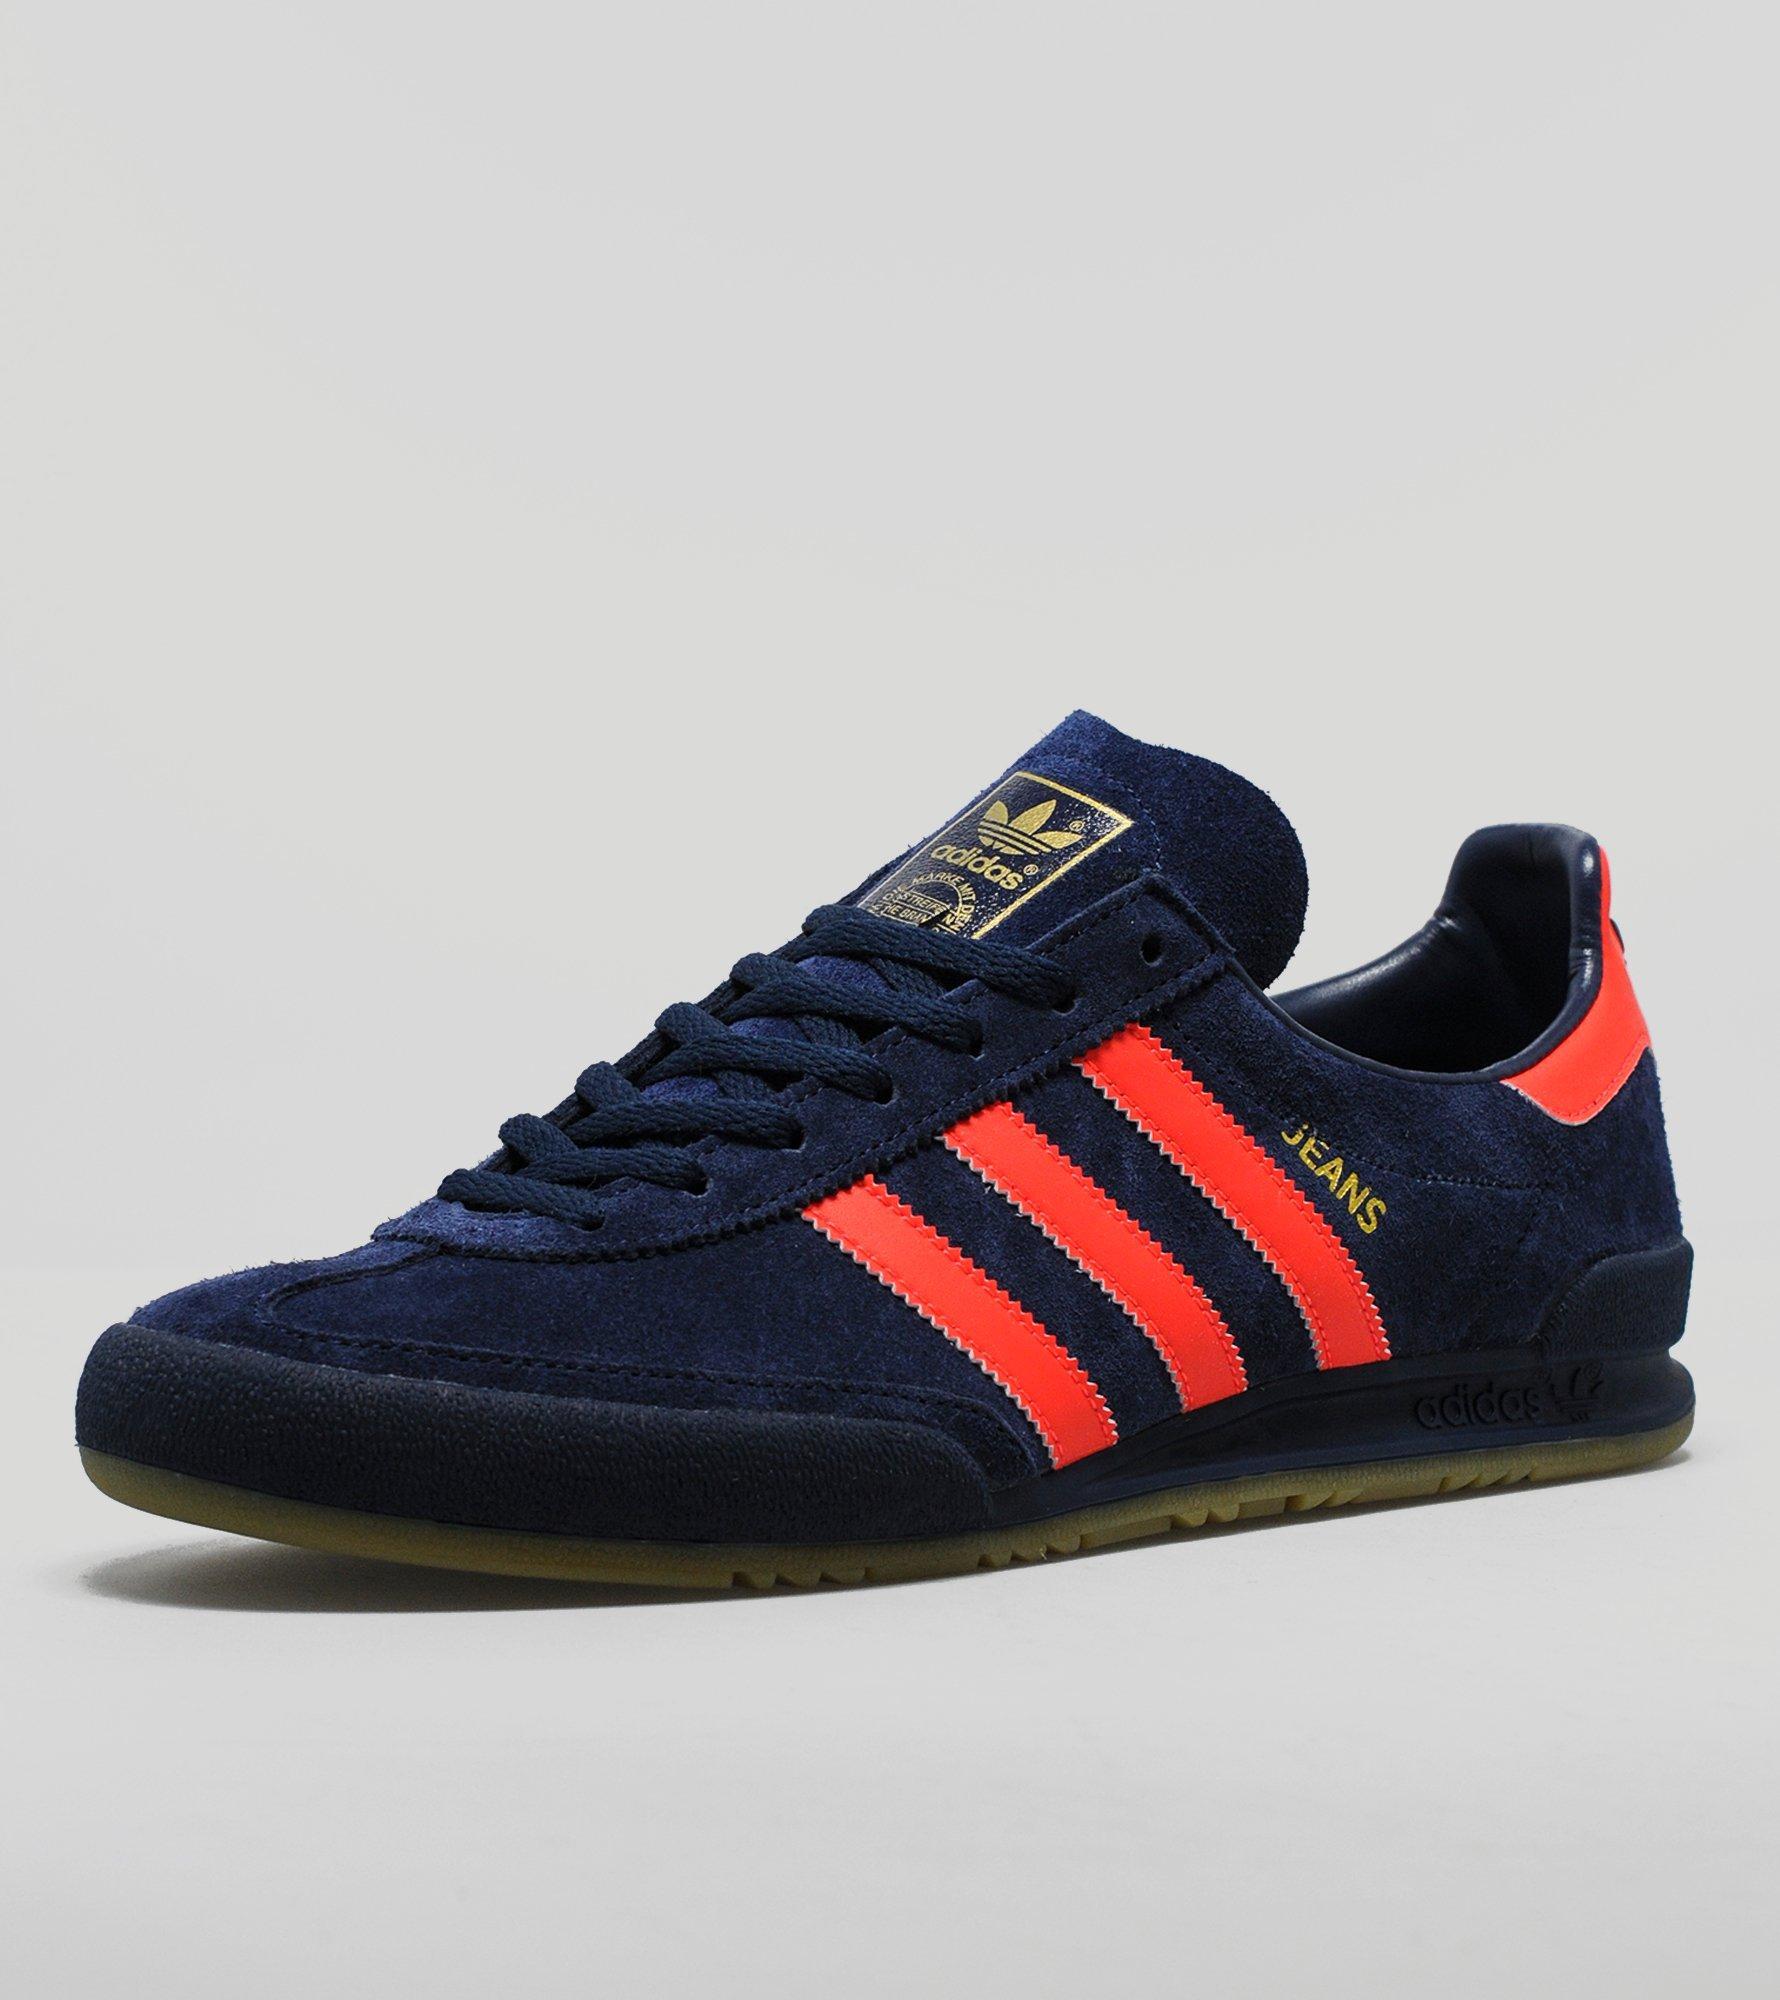 adidas jeans 2